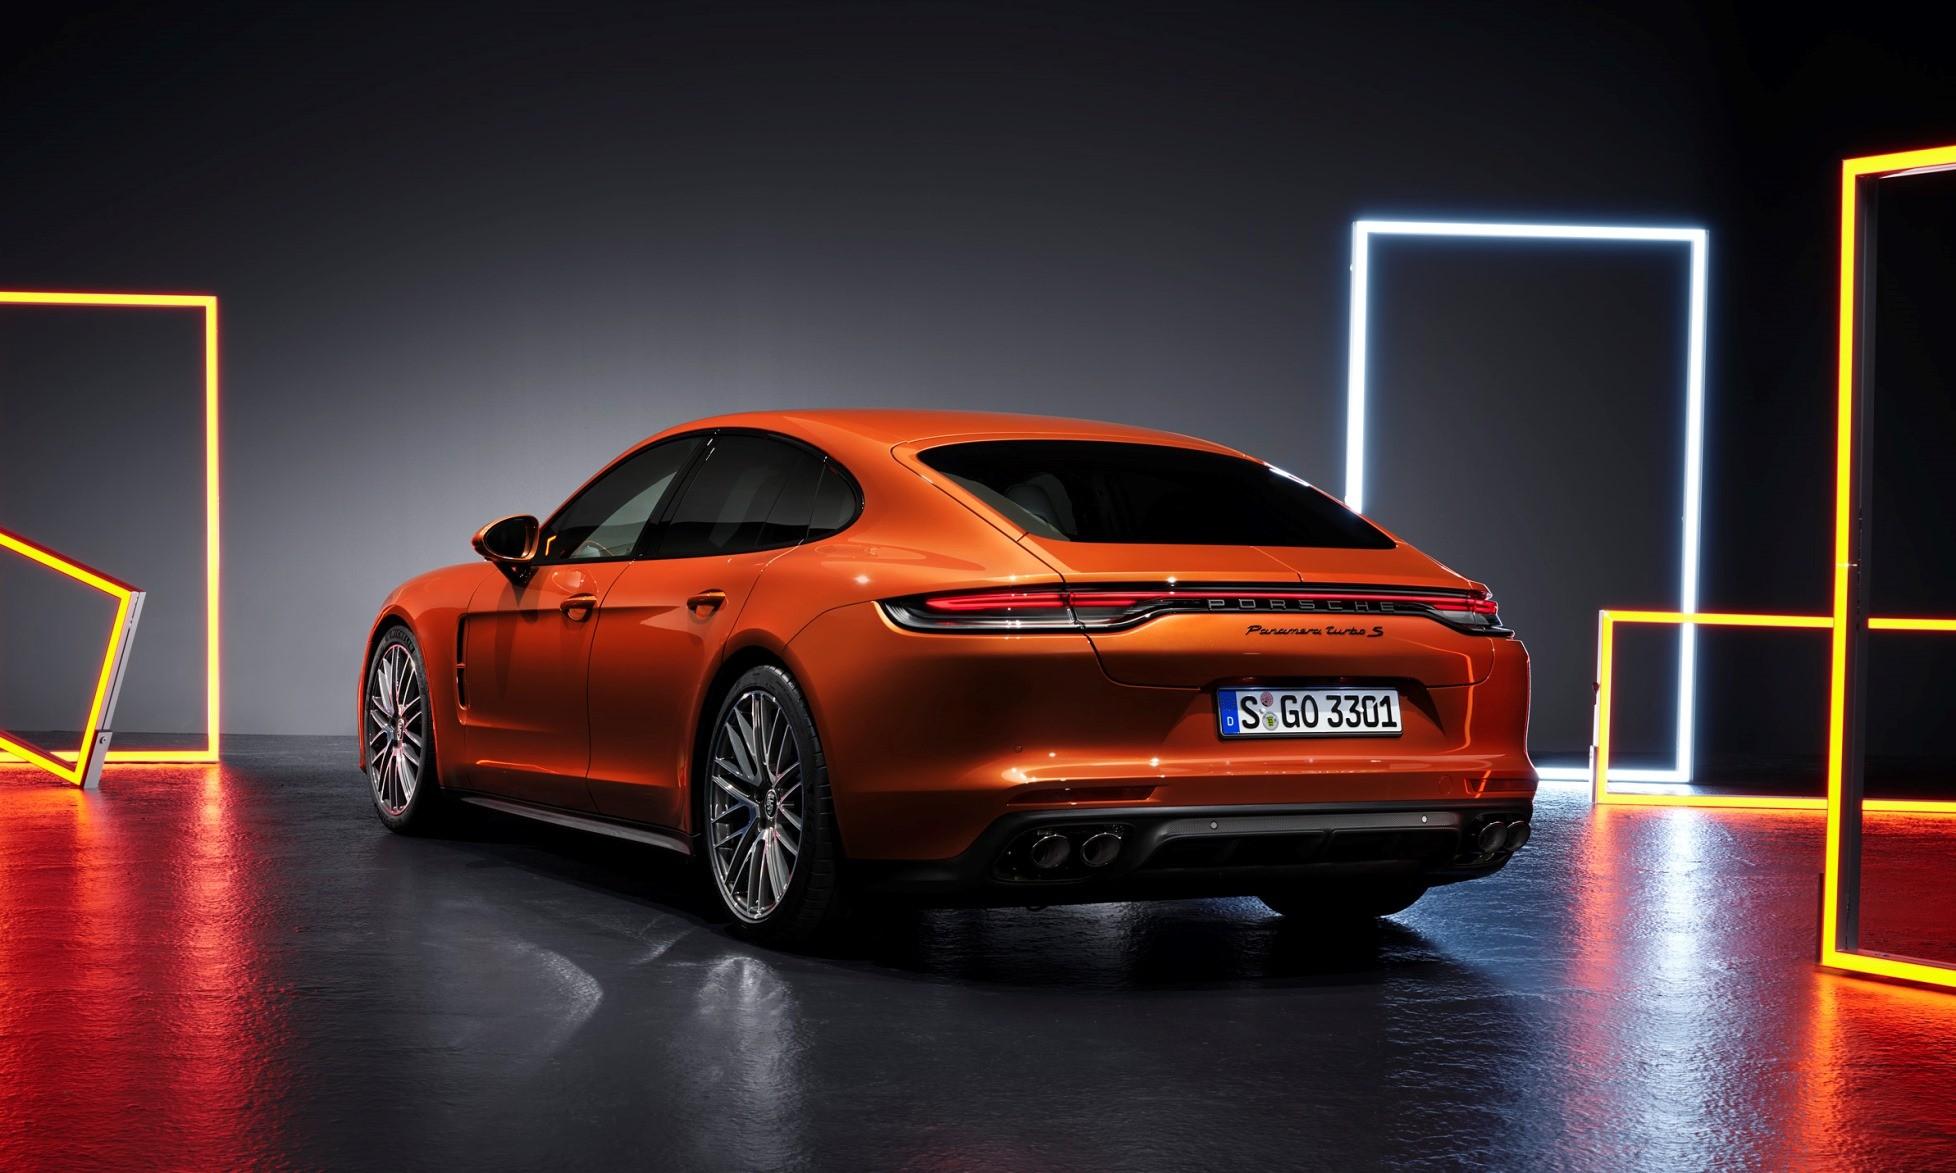 New Porsche Panamera Turbo S rear